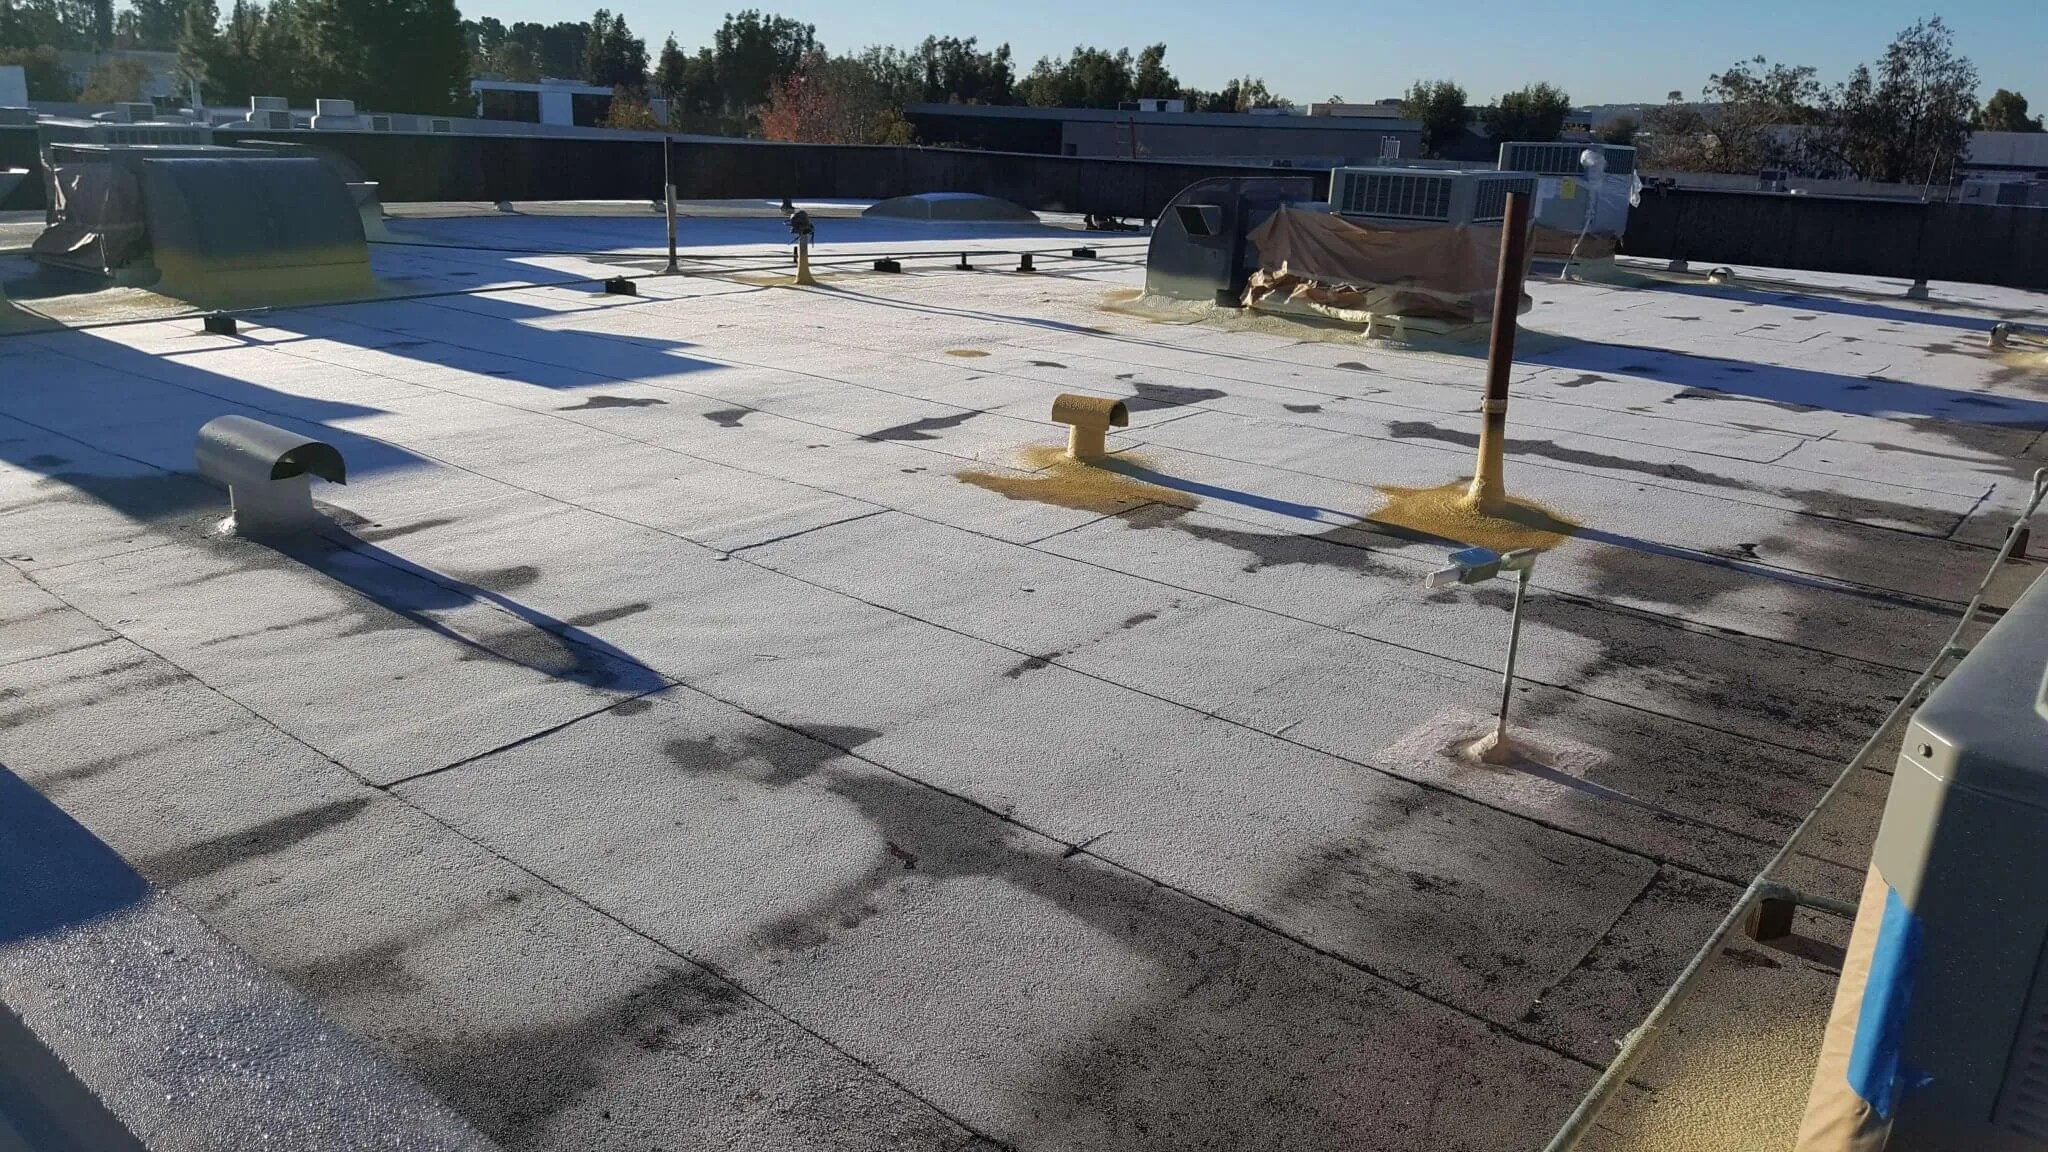 Hulsey Contracting Inc Spray Foam Roof Before & spray polyurethane foam Archives - Hulsey Contracting Inc ... memphite.com